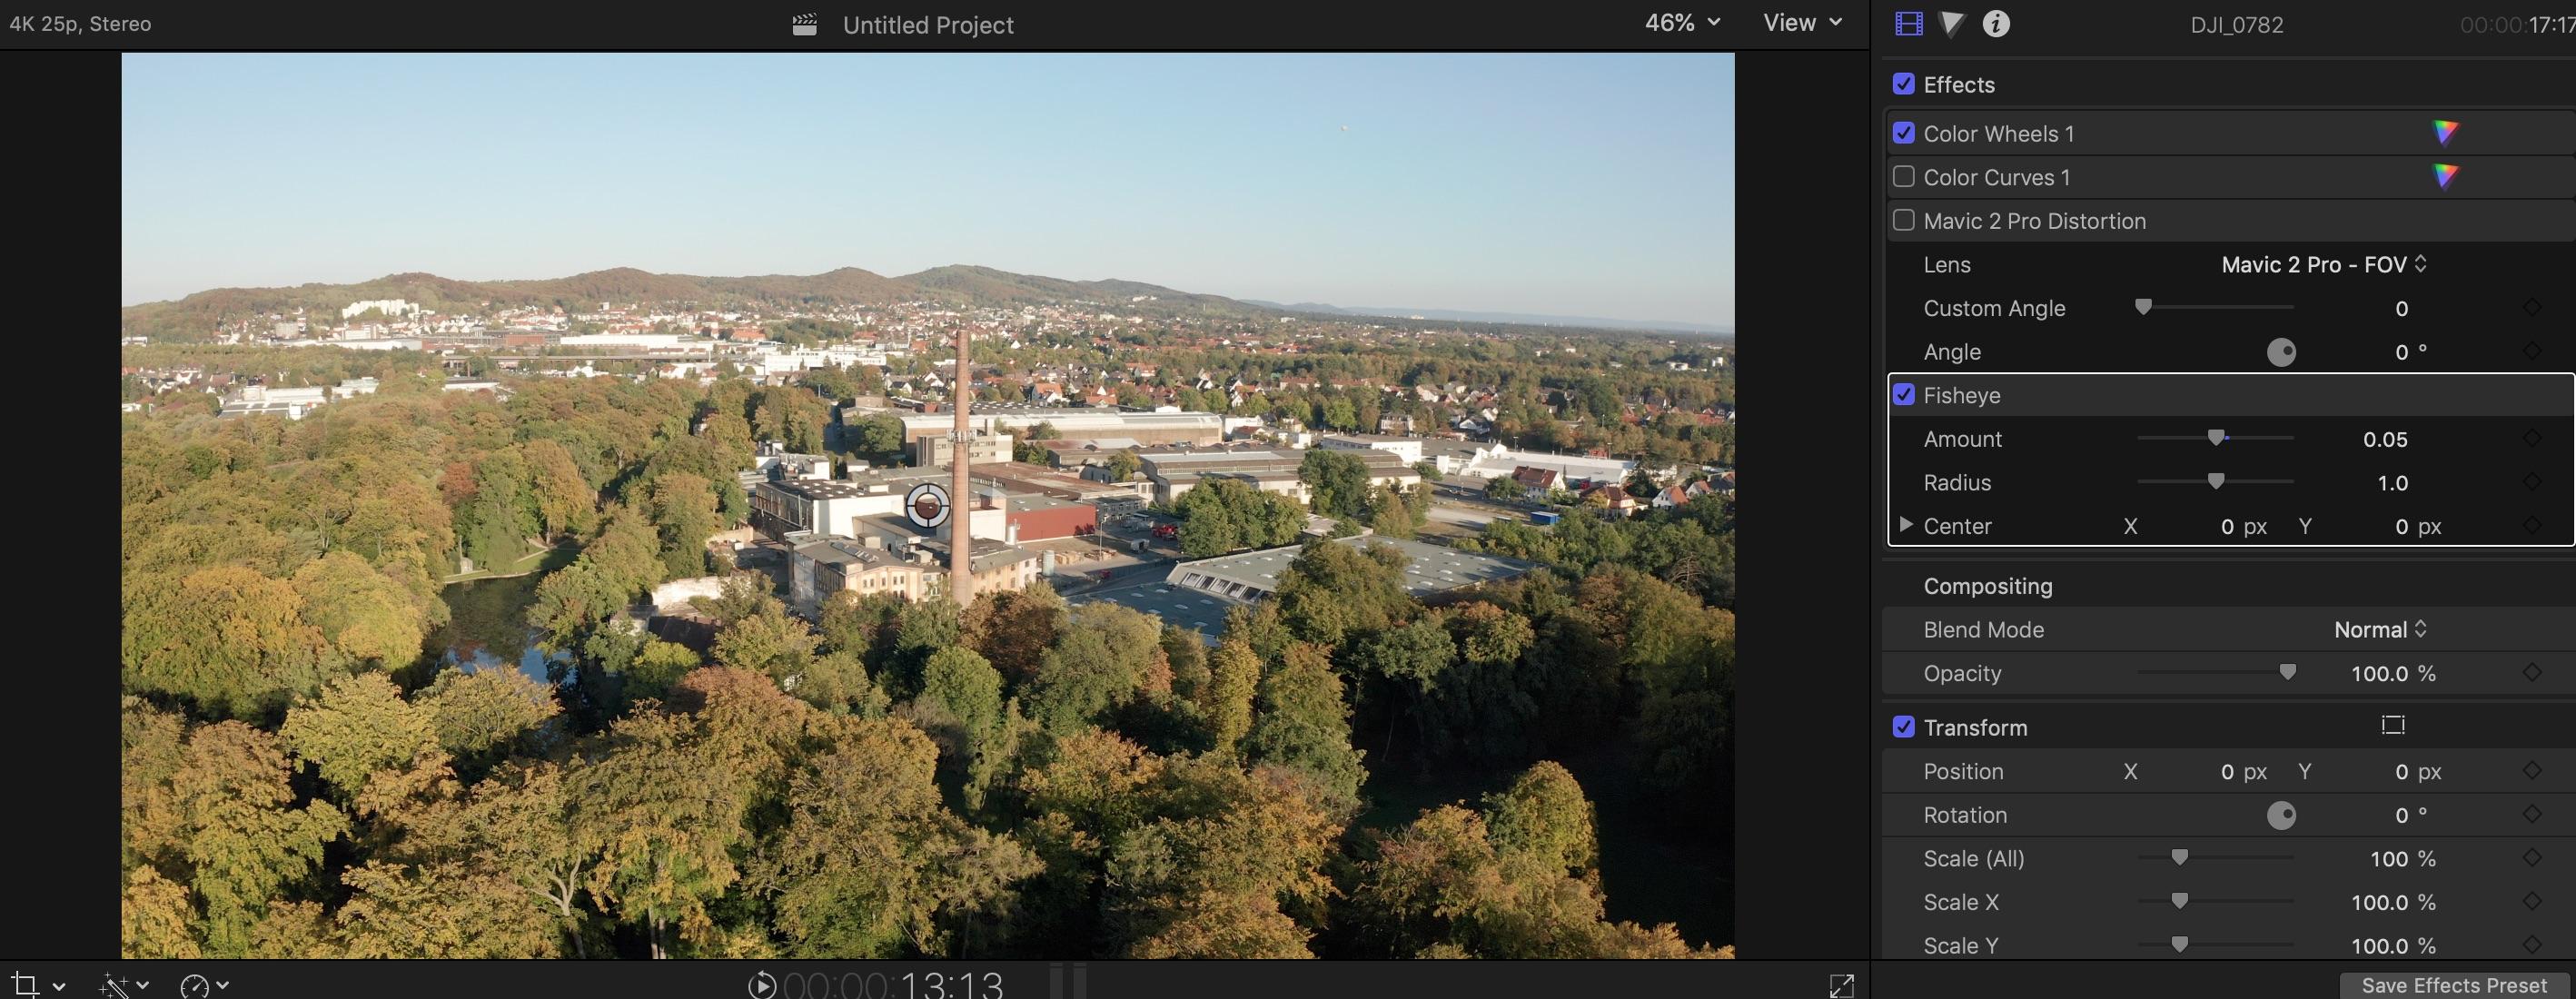 Screen Shot 2018-10-02 at 6.34.15 PM.jpg